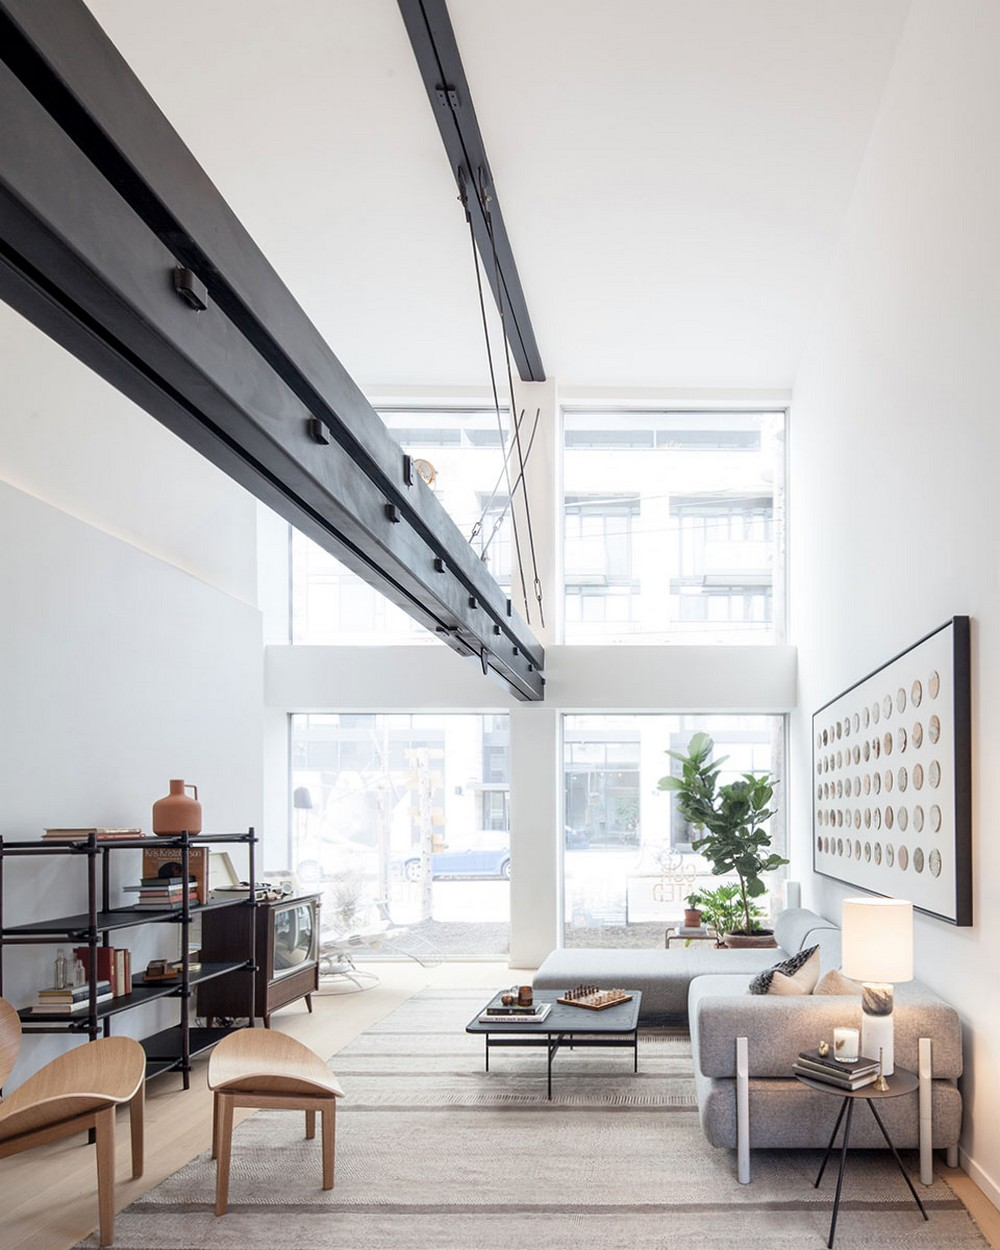 Top 20 Interior Designers From Toronto toronto The Best Interior Designers From Toronto mason studio